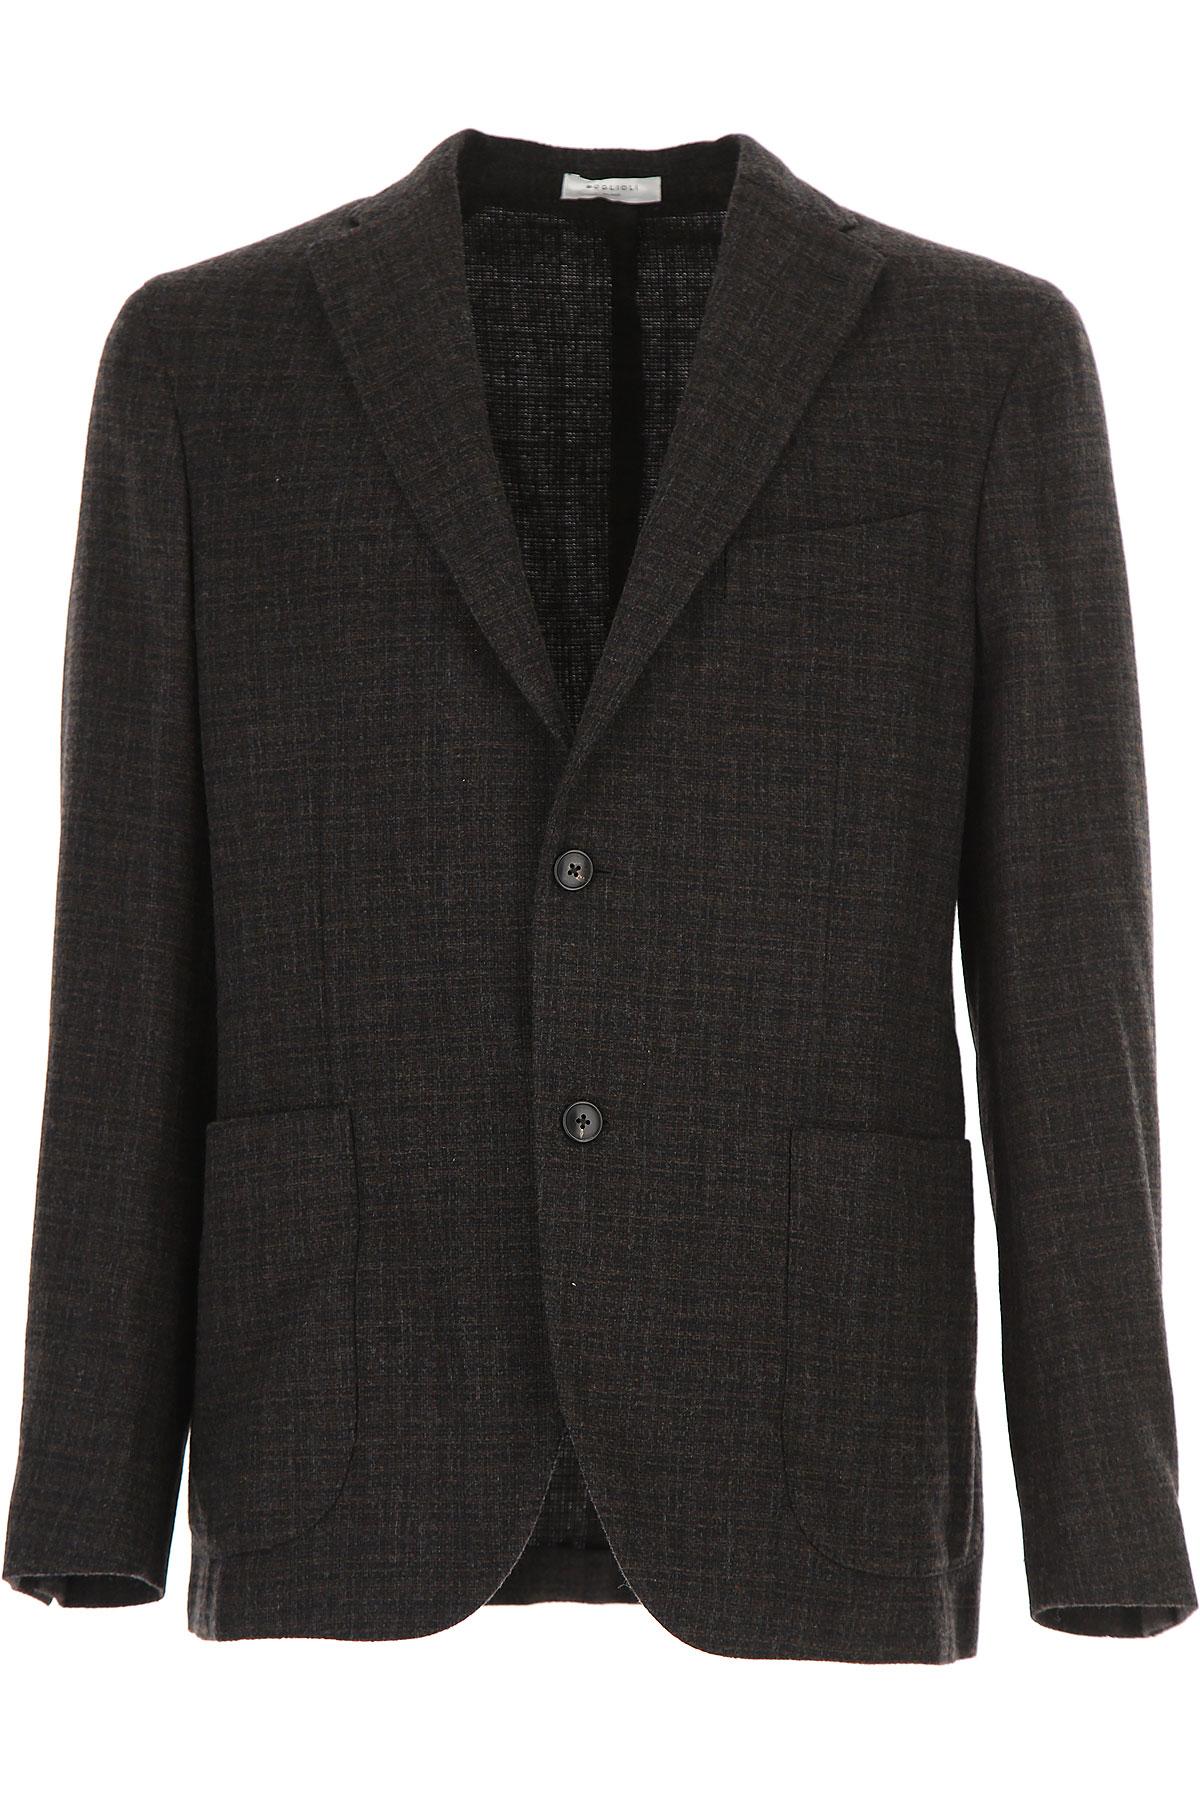 Image of Boglioli Blazer for Men, Sport Coat, Dark Grey, Wool, 2017, L M XXL